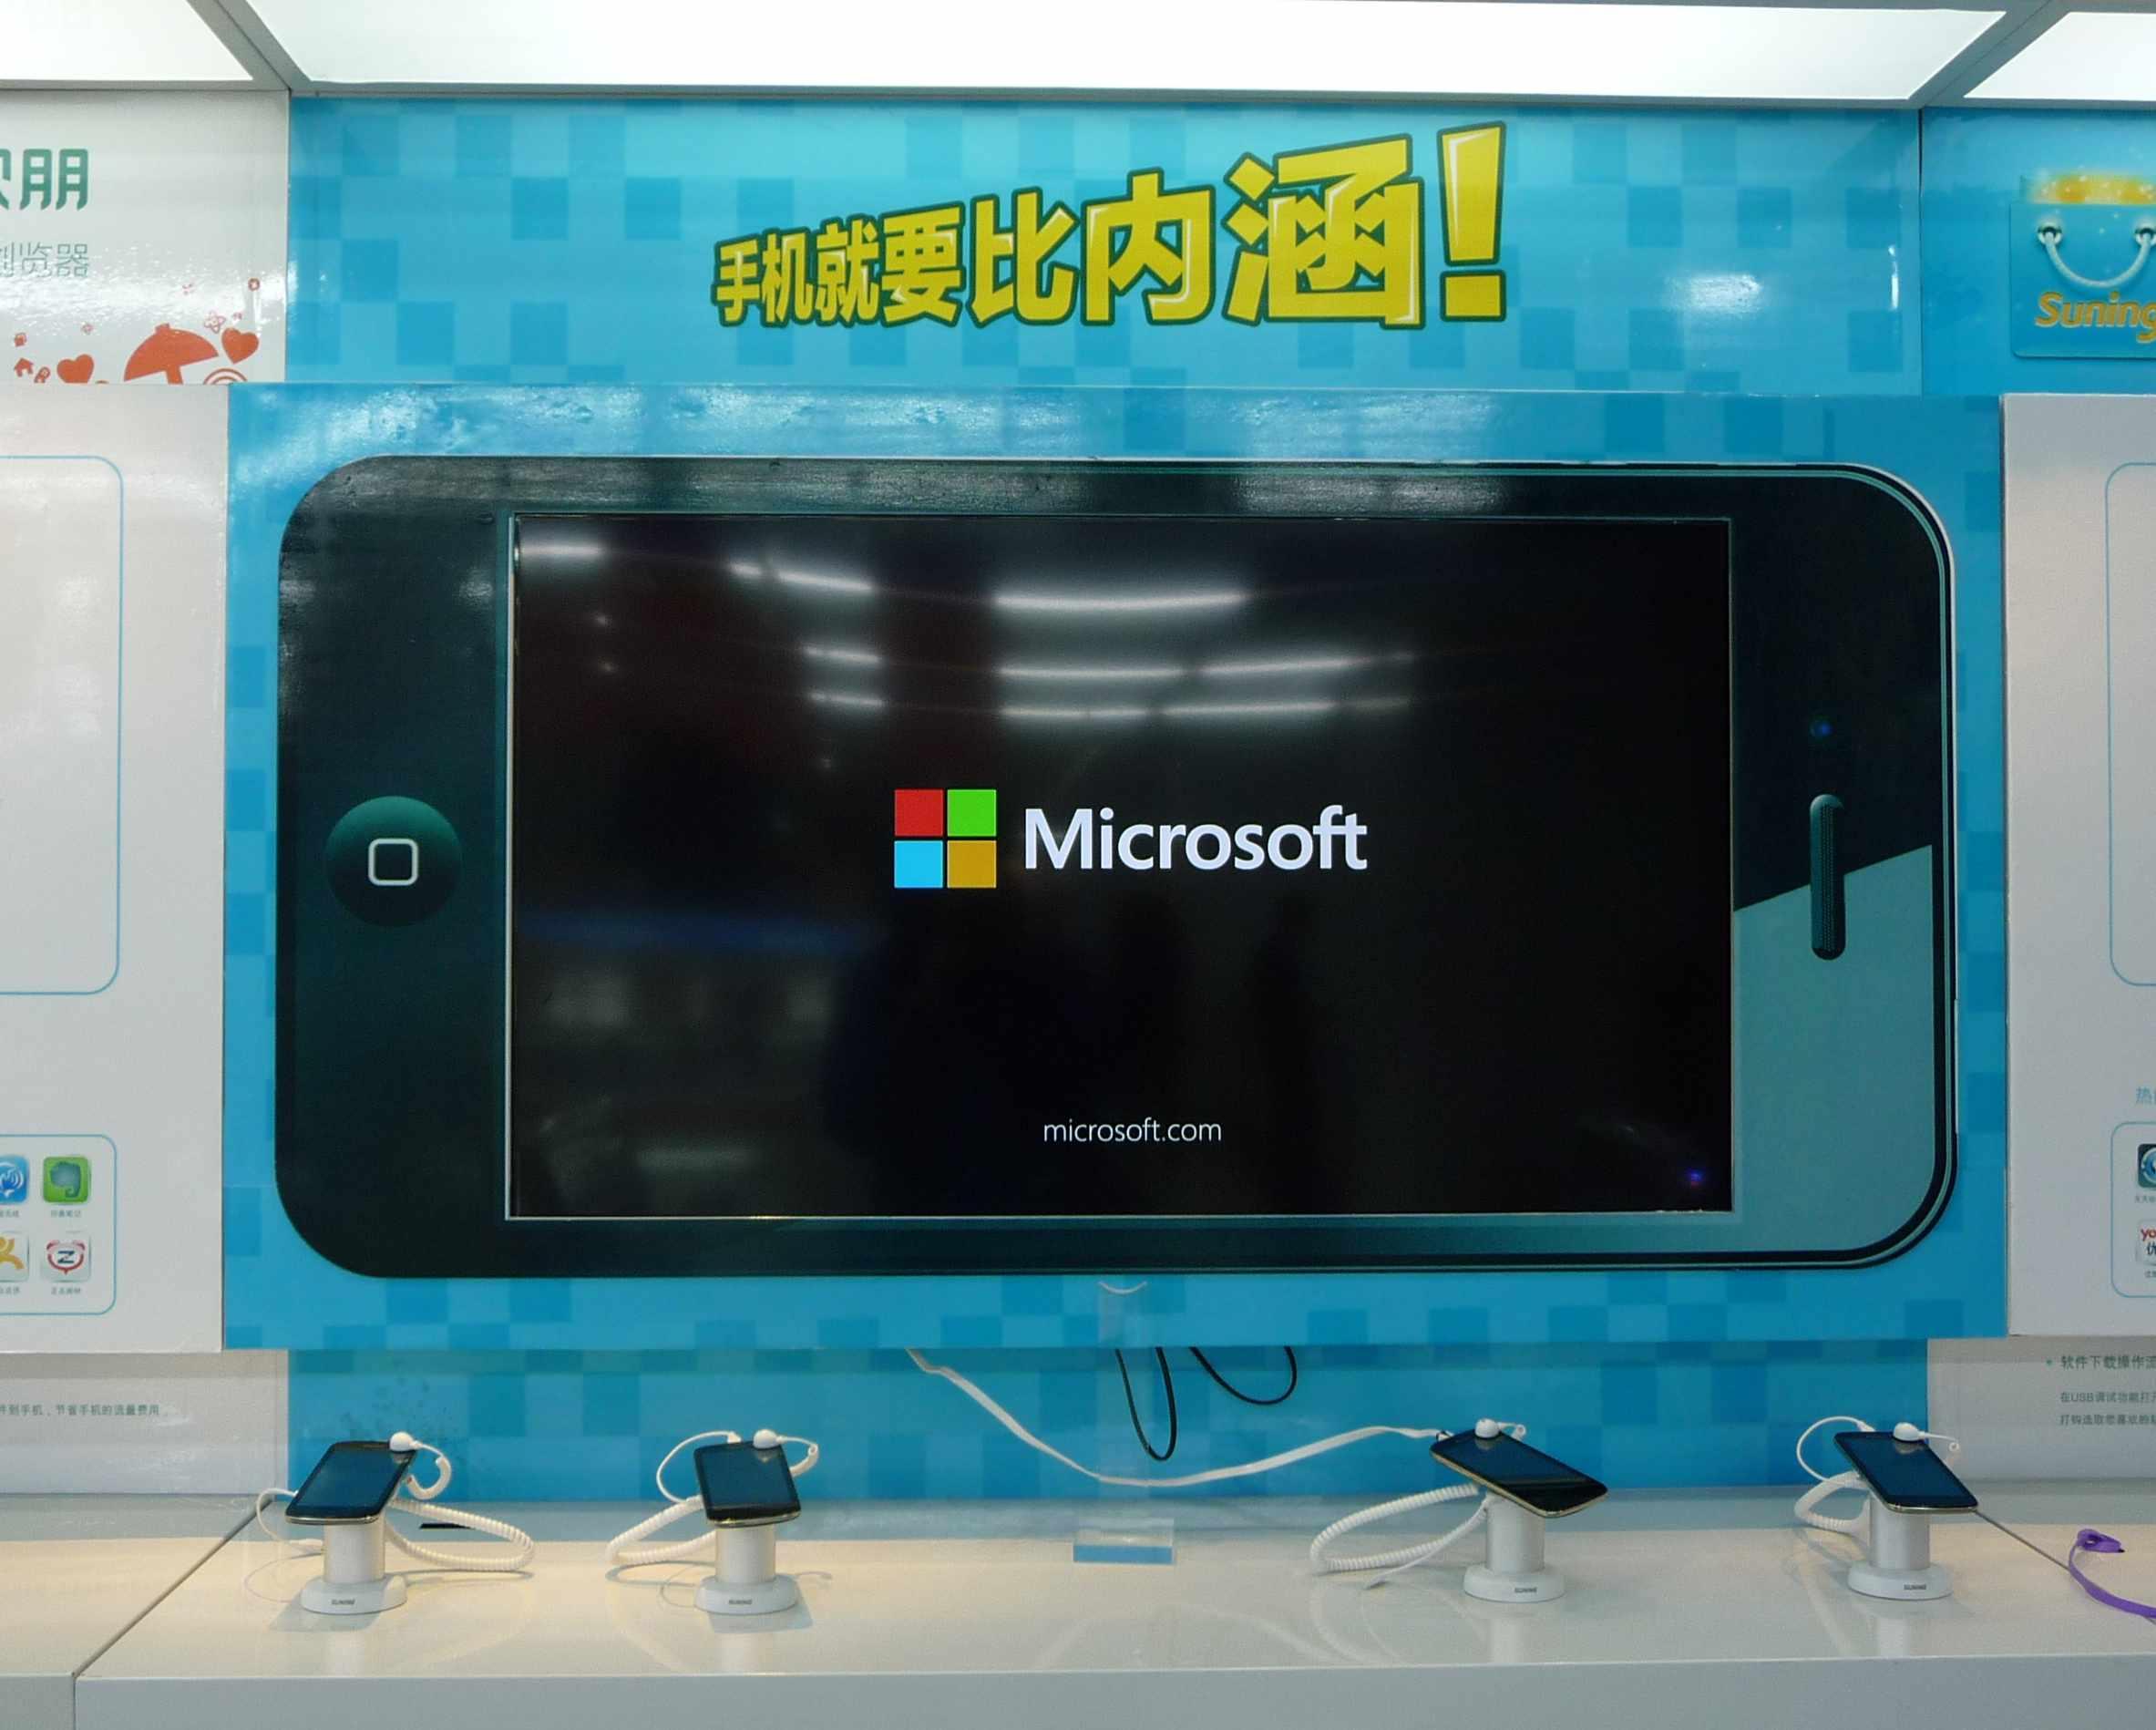 iPhone mit Microsoft Werbung